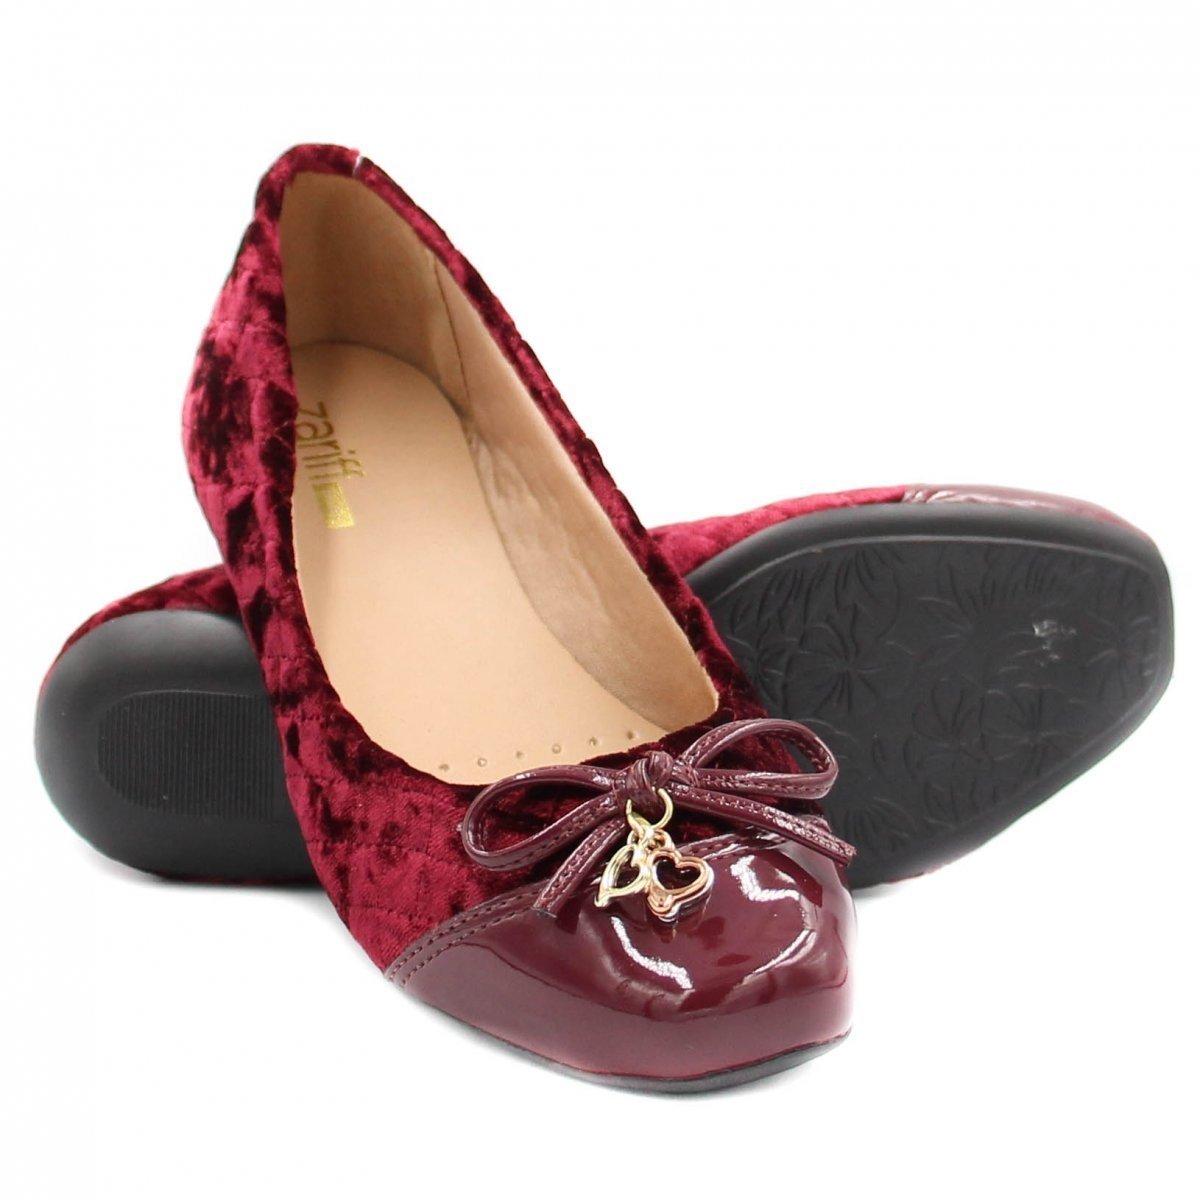 Shoes Sapatilha Zariff Zariff Sapatilha Vermelho Matelassê Verniz Feminina gt7xZS7wq